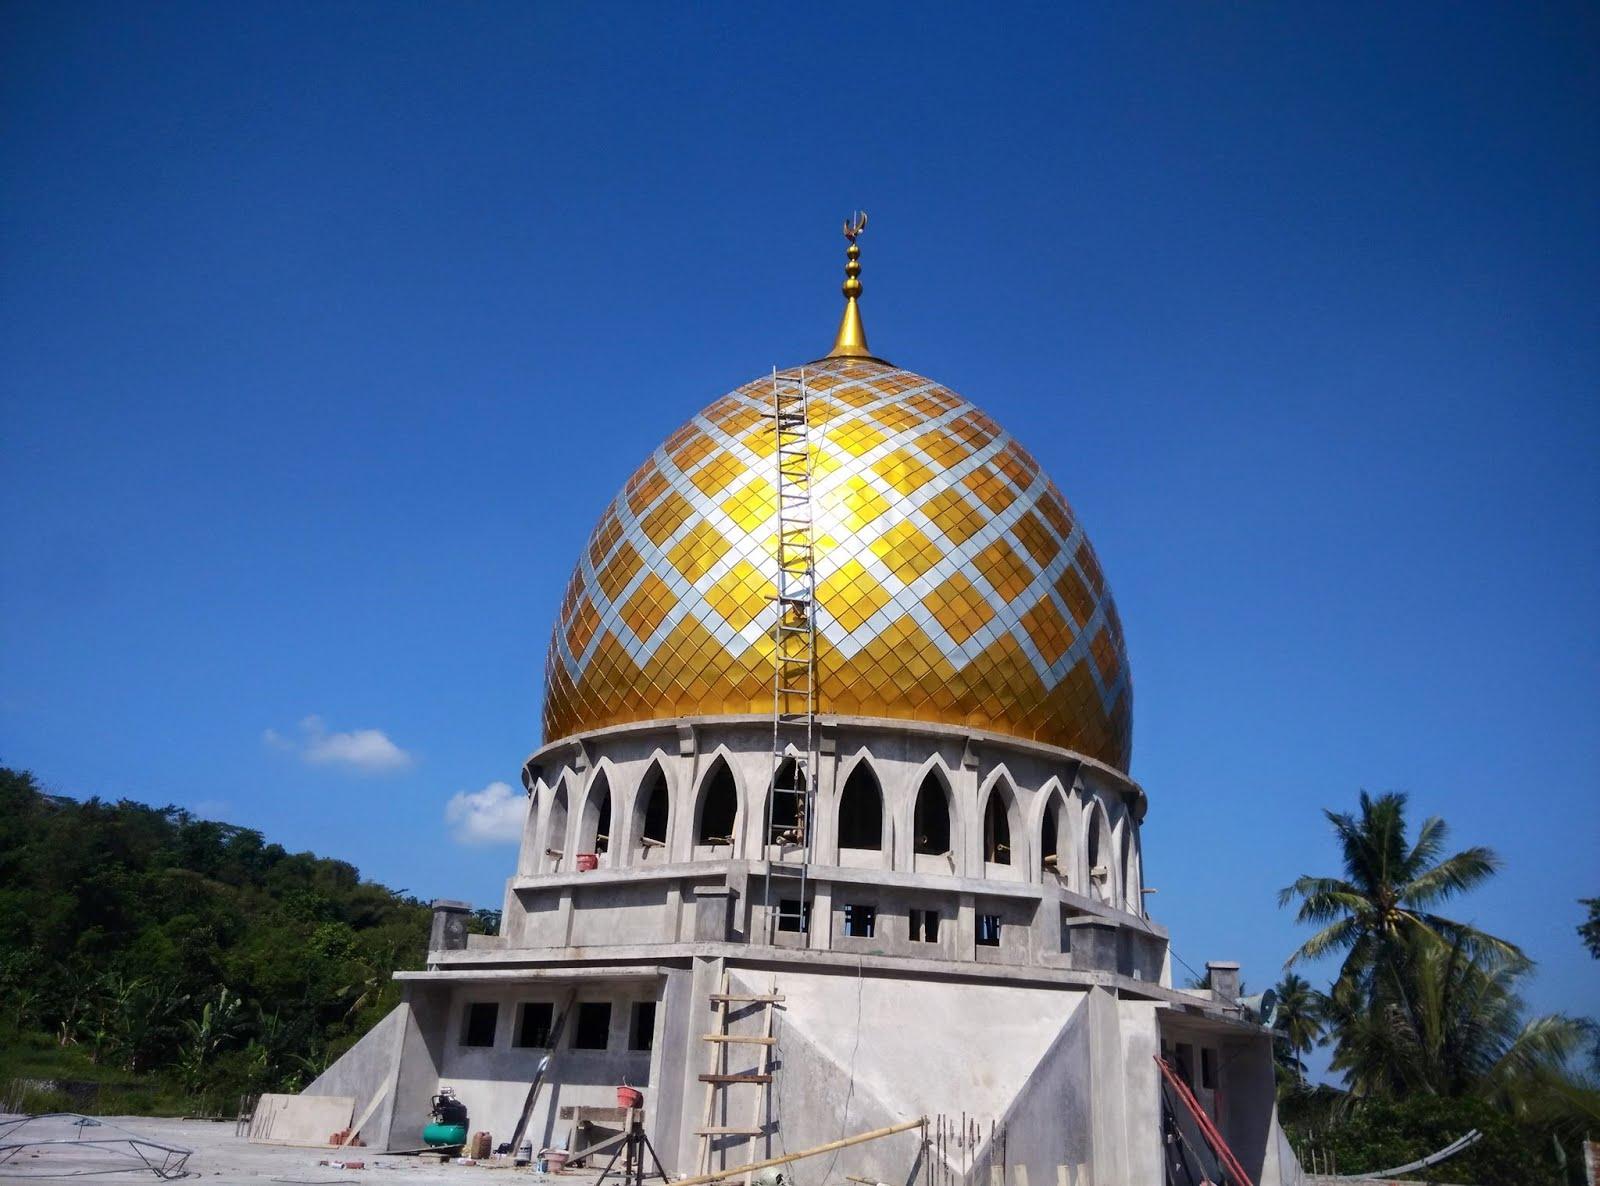 Kubah Masjid Dibuat Bulan dan Bintang, Ternyata Sumbernya